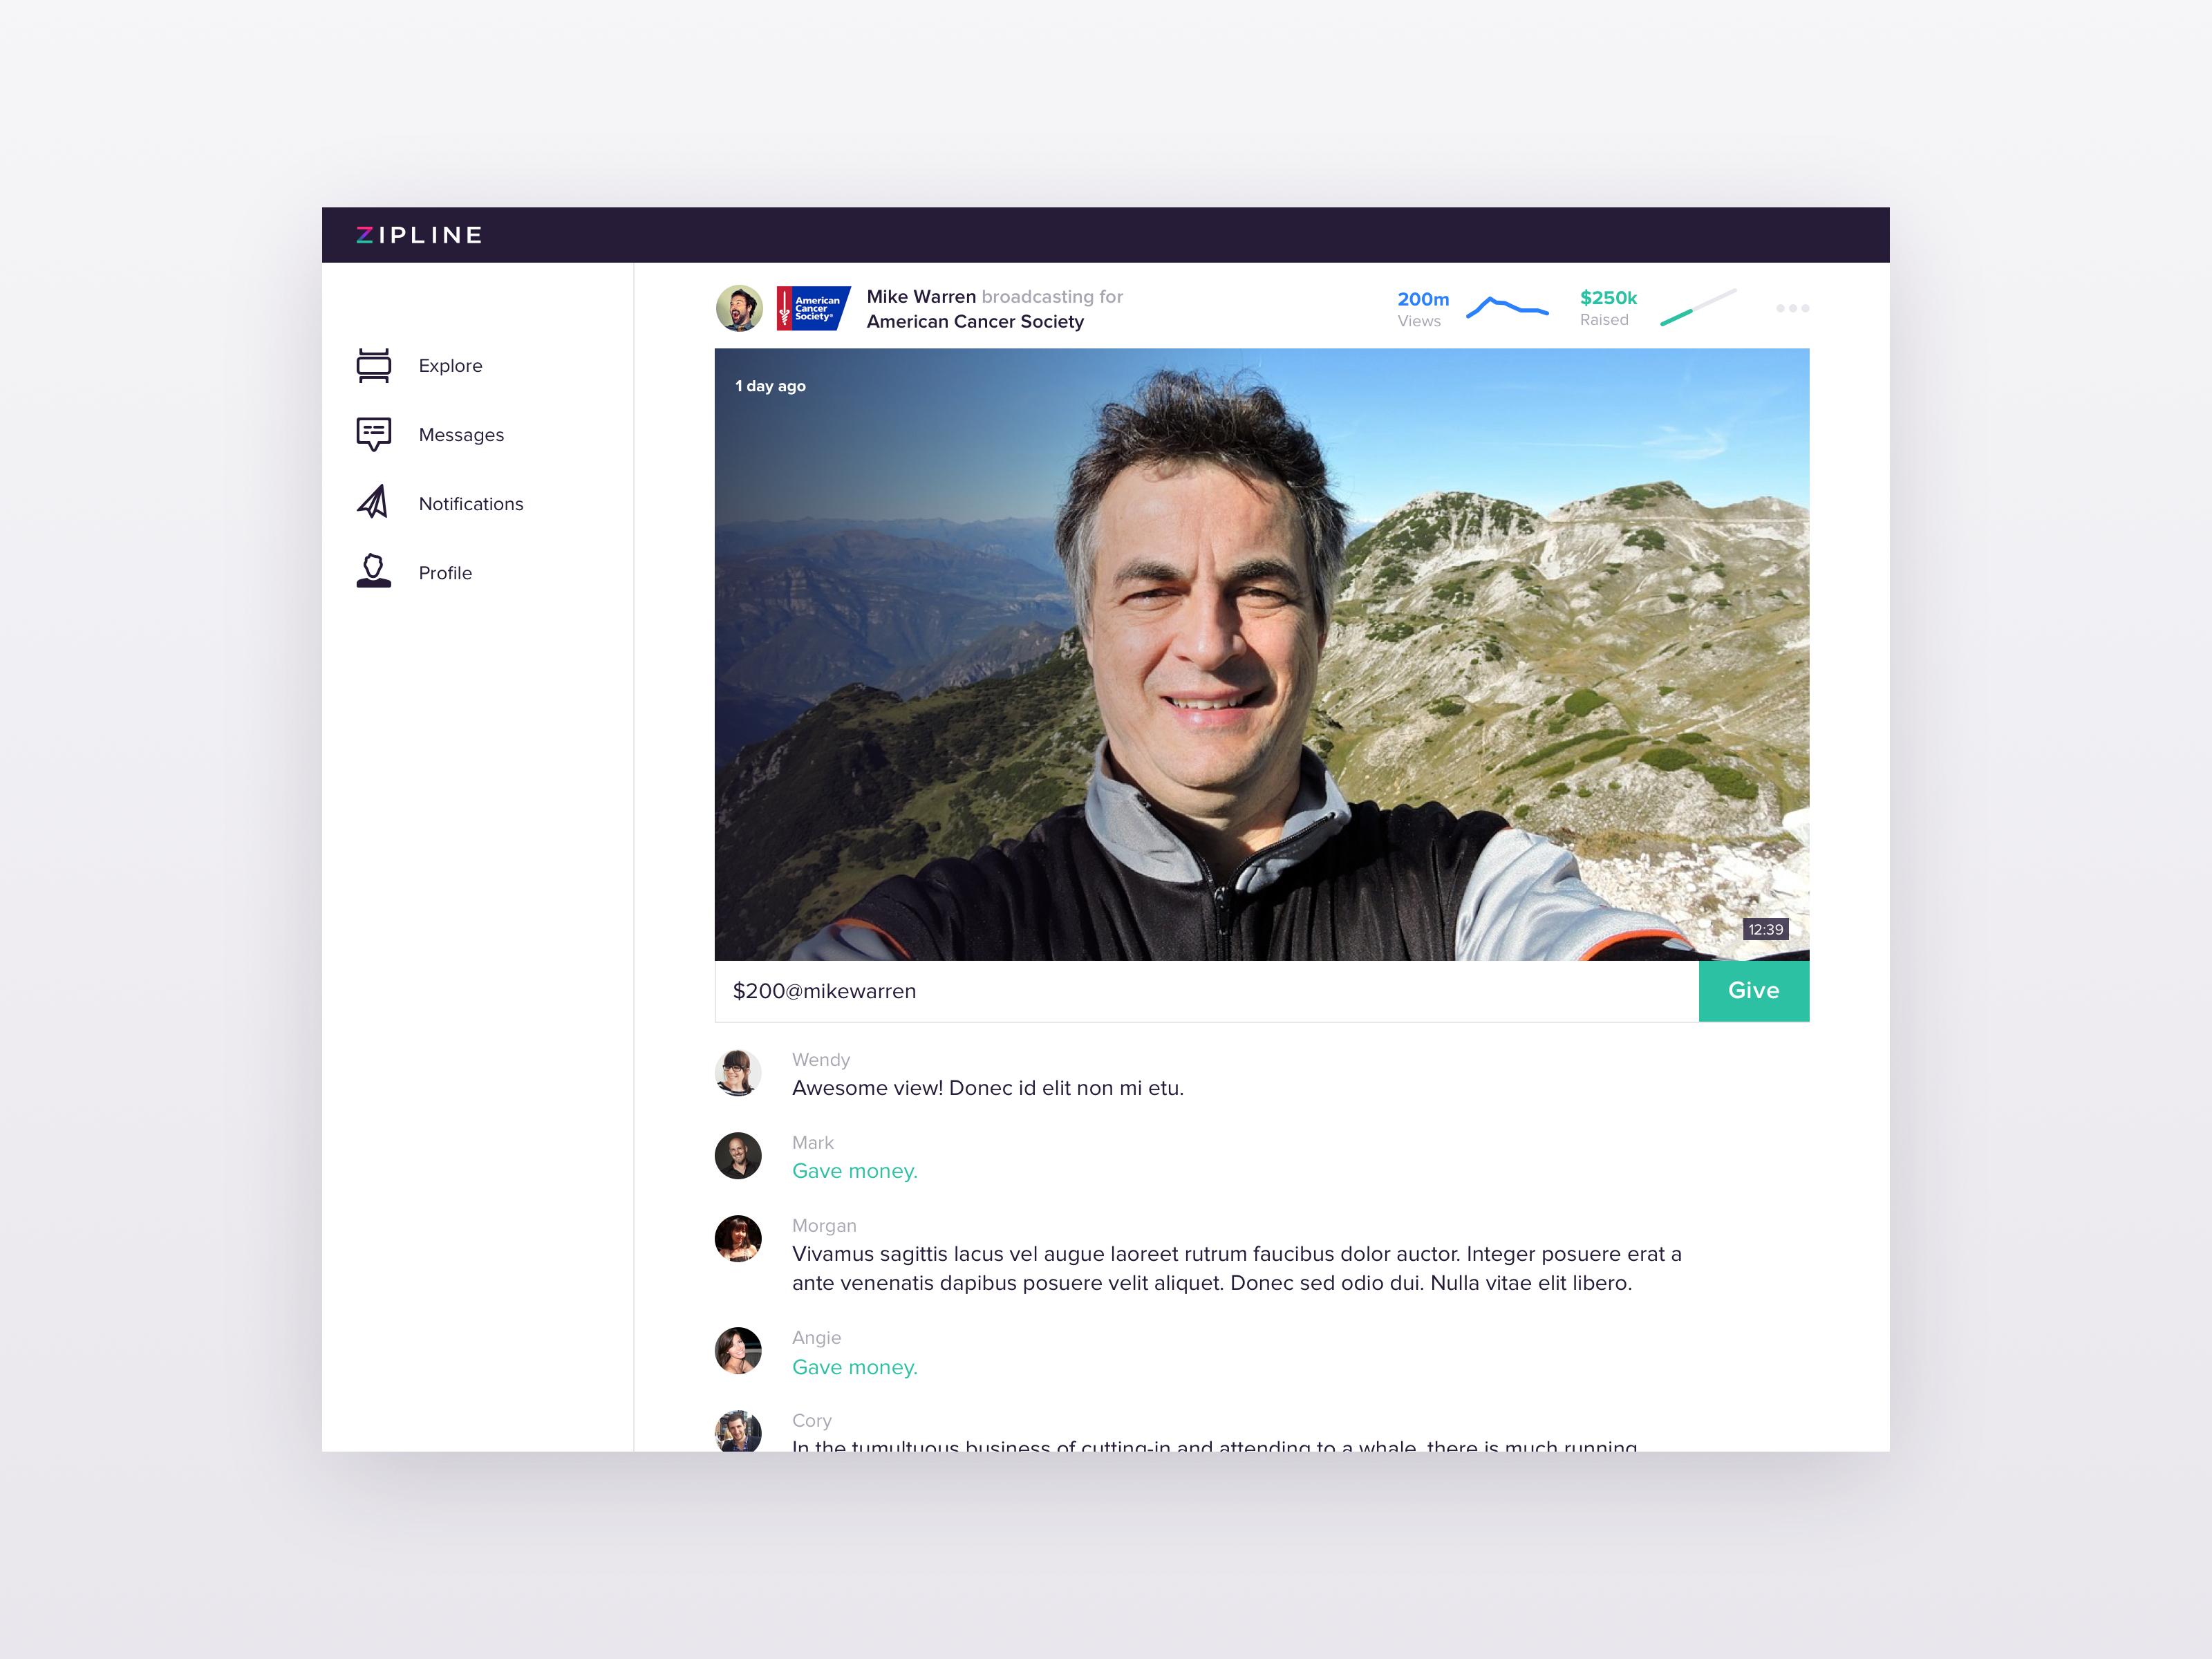 Zl desktop app